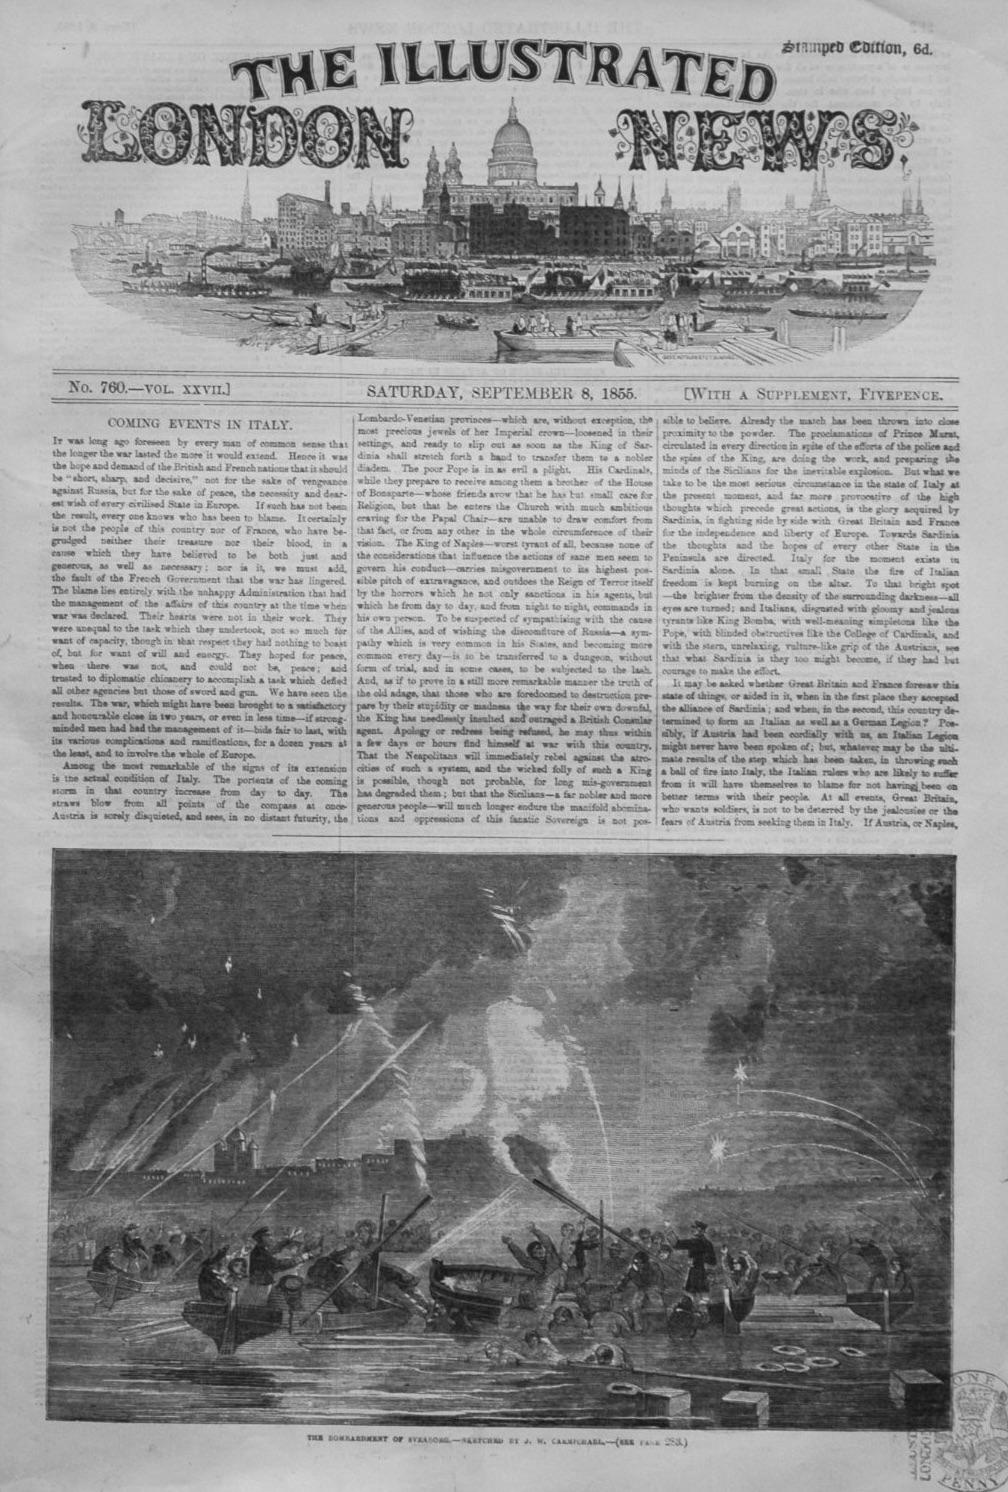 Illustrated London News September 8th. 1855.